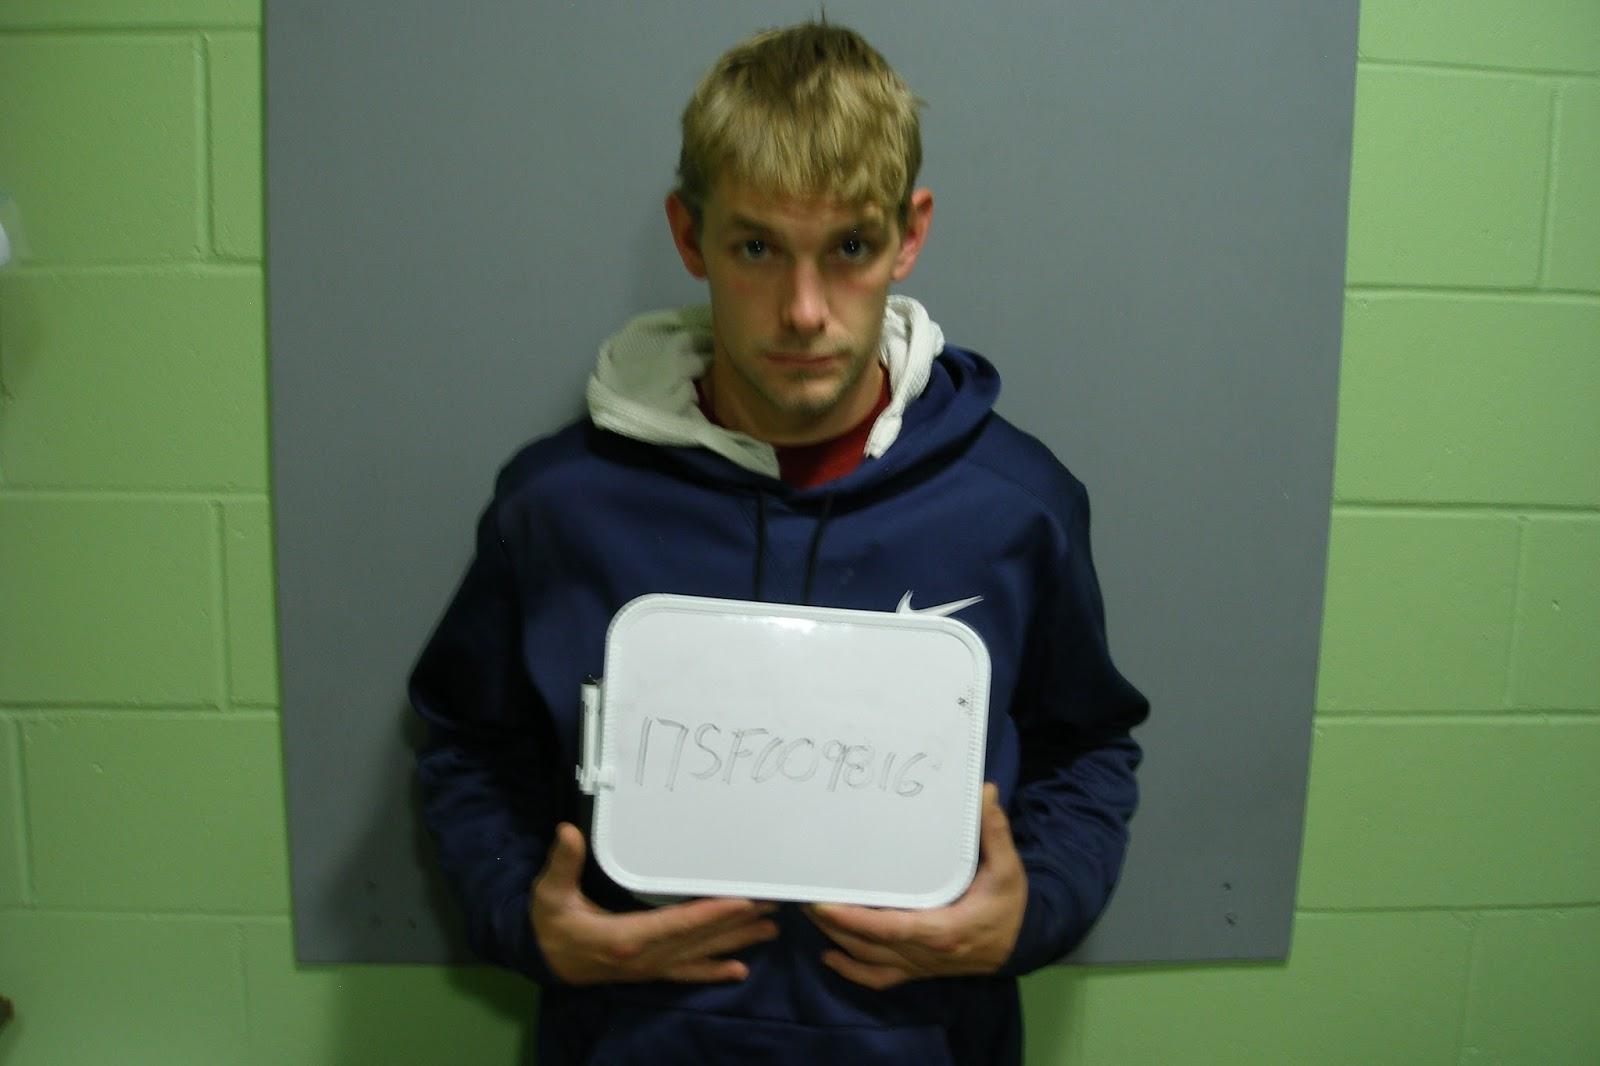 Springfield, VT Police Department: Arrest - Fugitive From Justice